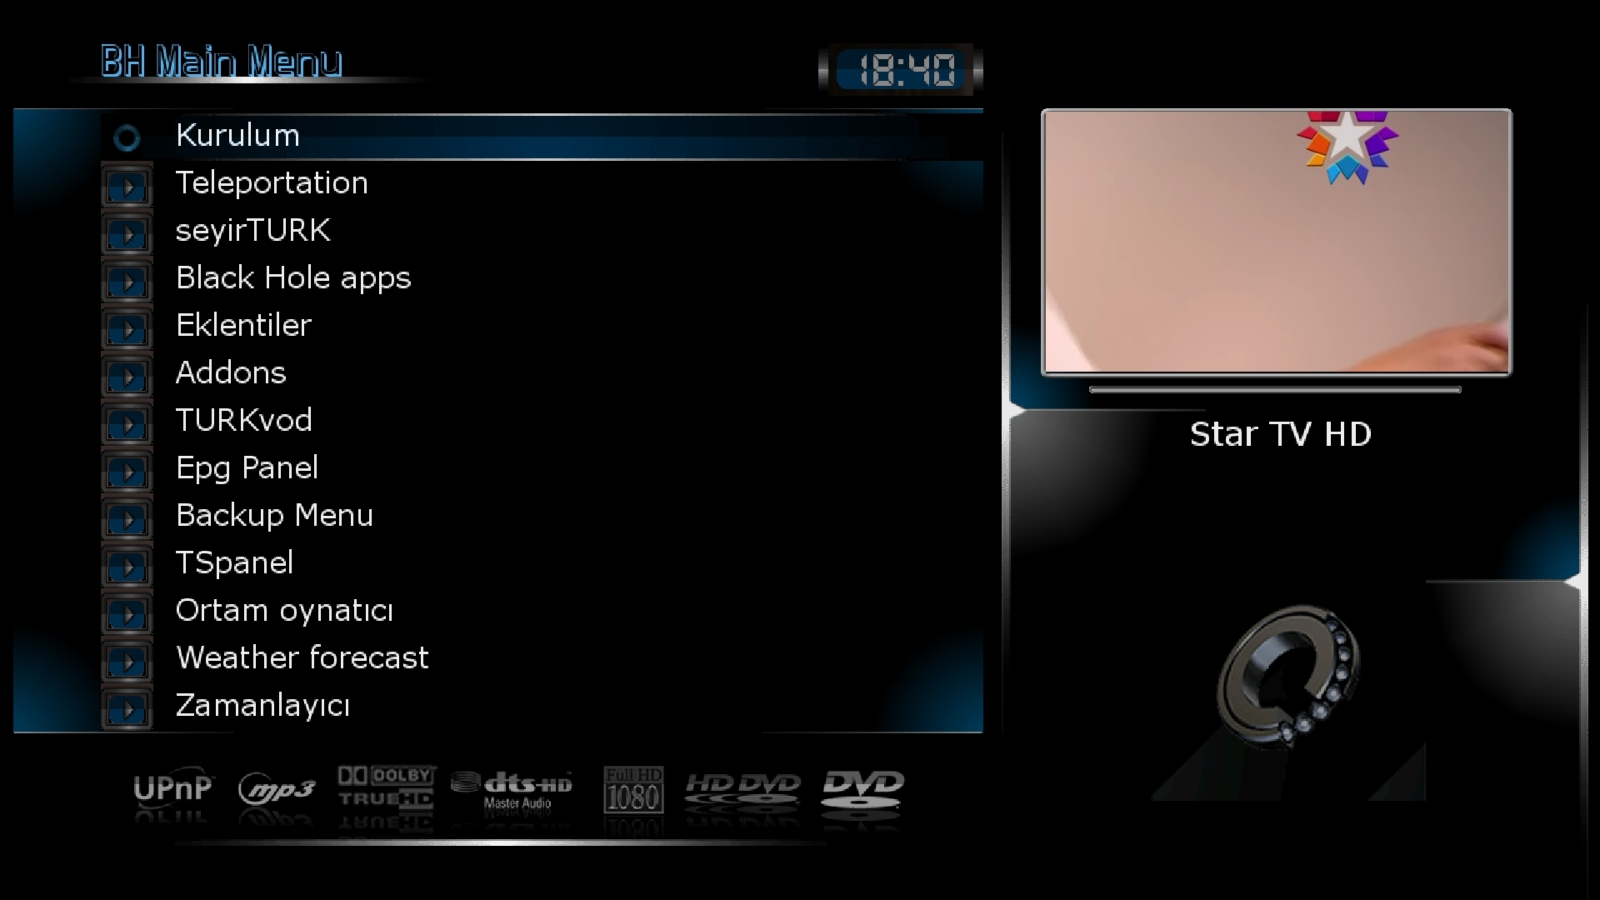 Black Hole Vu+ Ultimo 2.0.3 Hyperspace Backup By AYBERK 27.05.2013